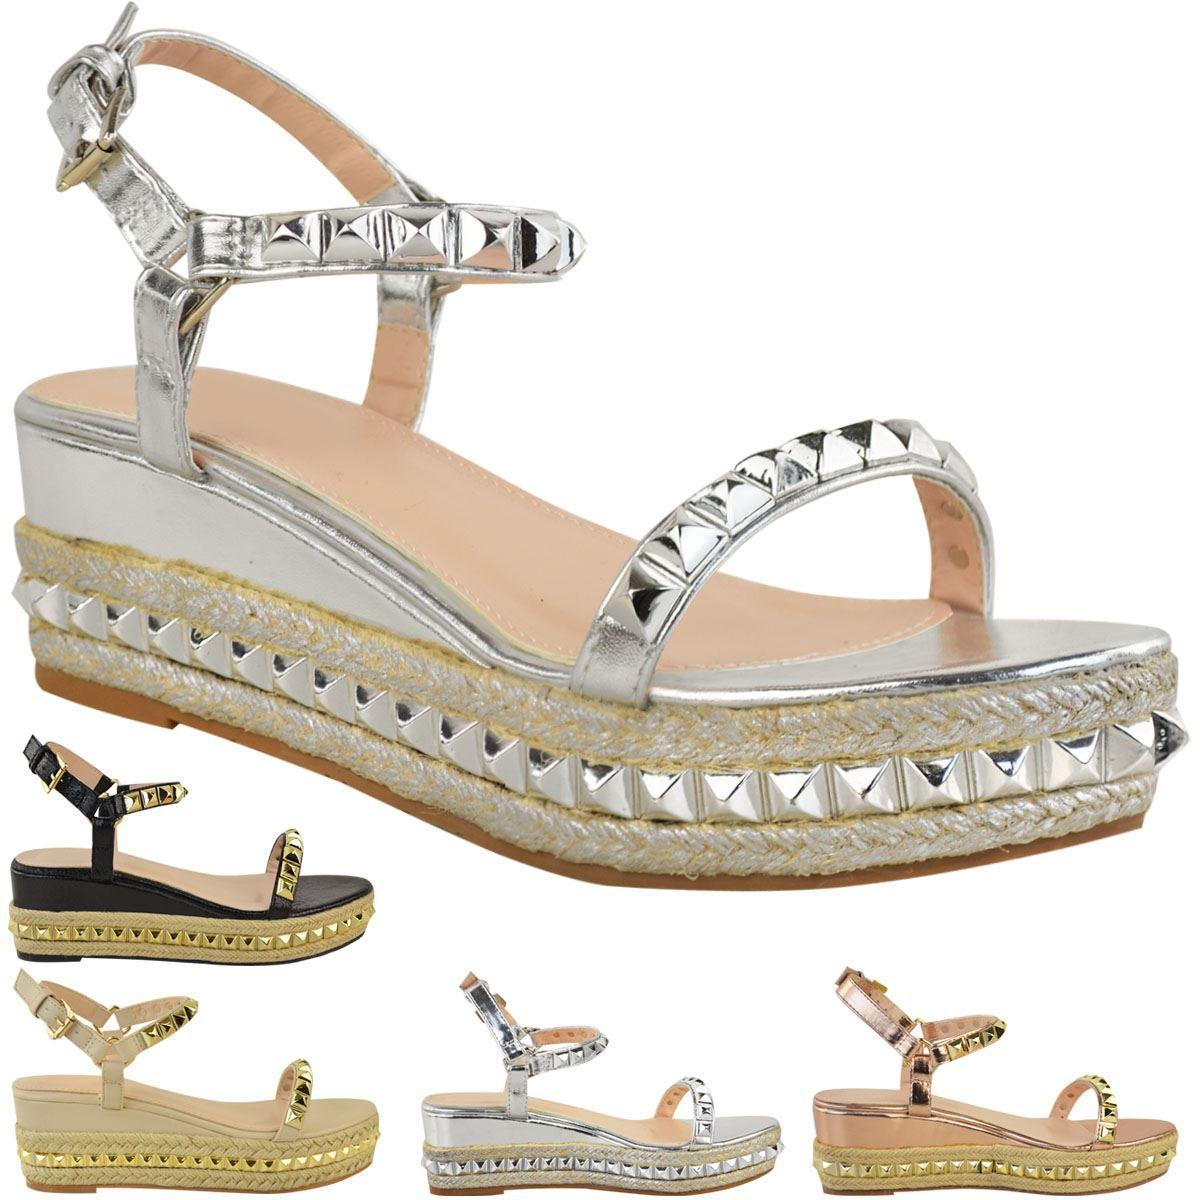 62c5b765d91 Ladies Womens Studded Low Wedge Espadrille Sandals Platform Rose ...